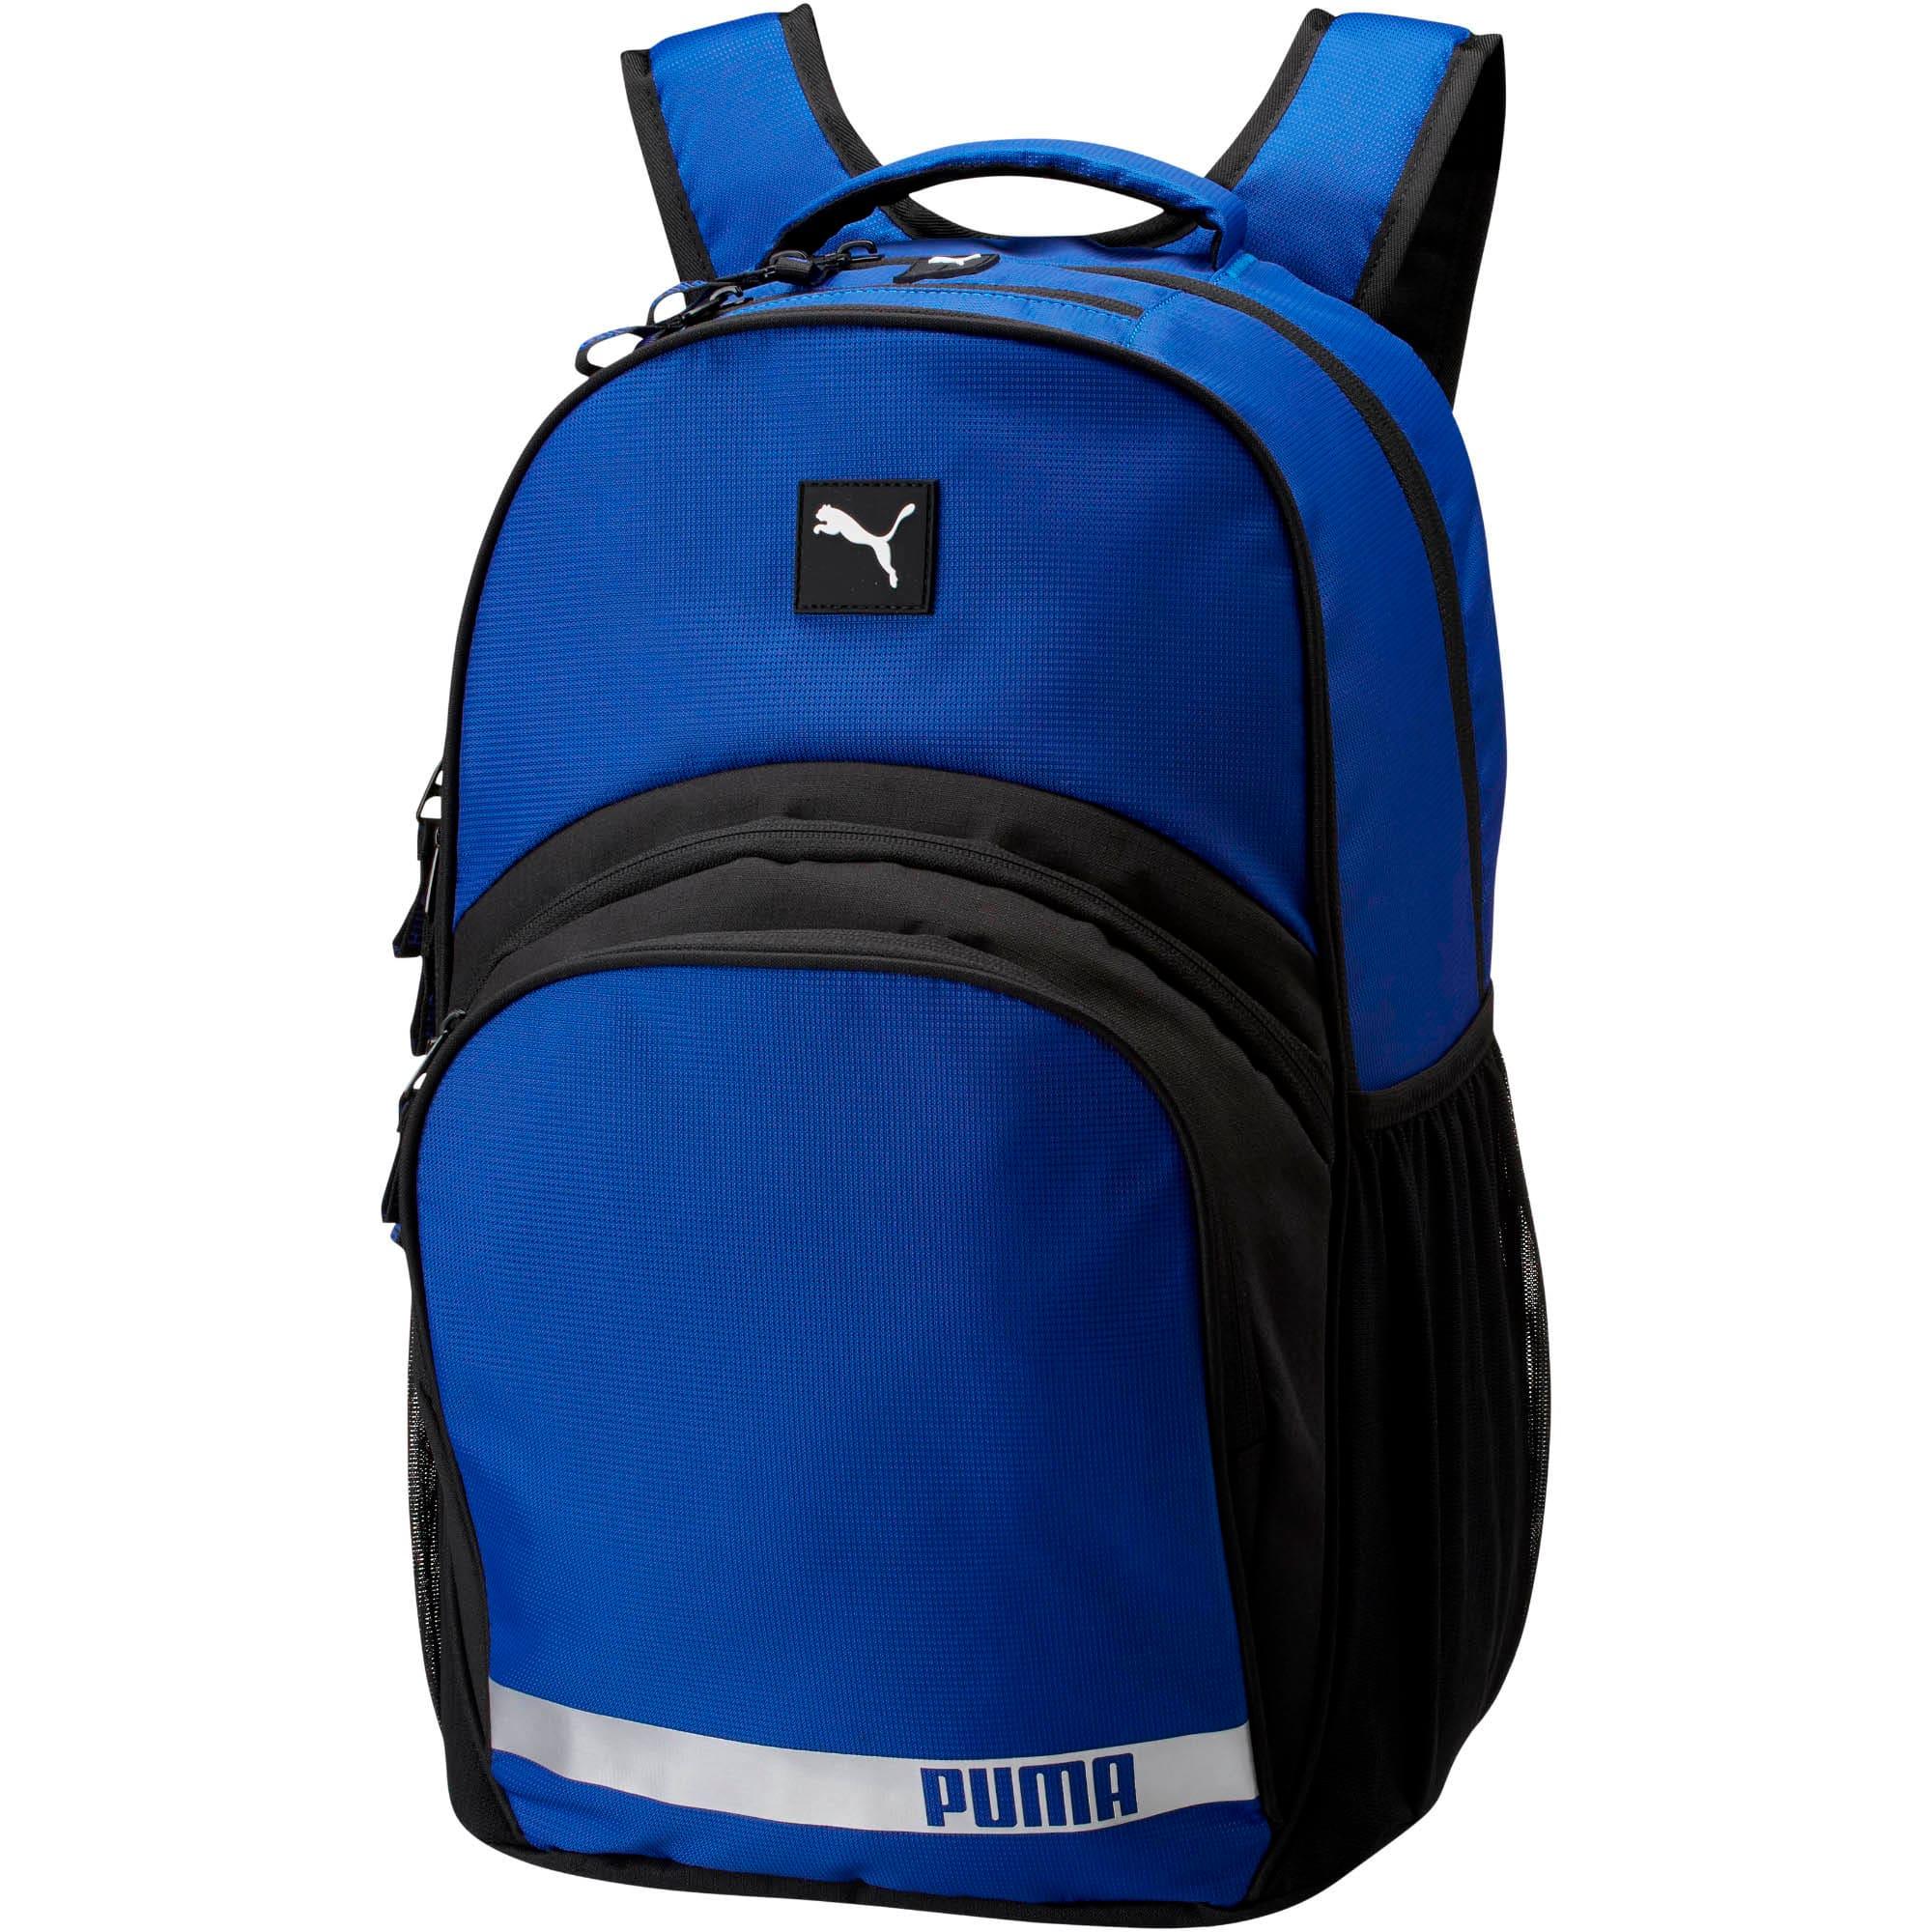 Thumbnail 1 of Formation 2.0 Ball Backpack, Blue, medium